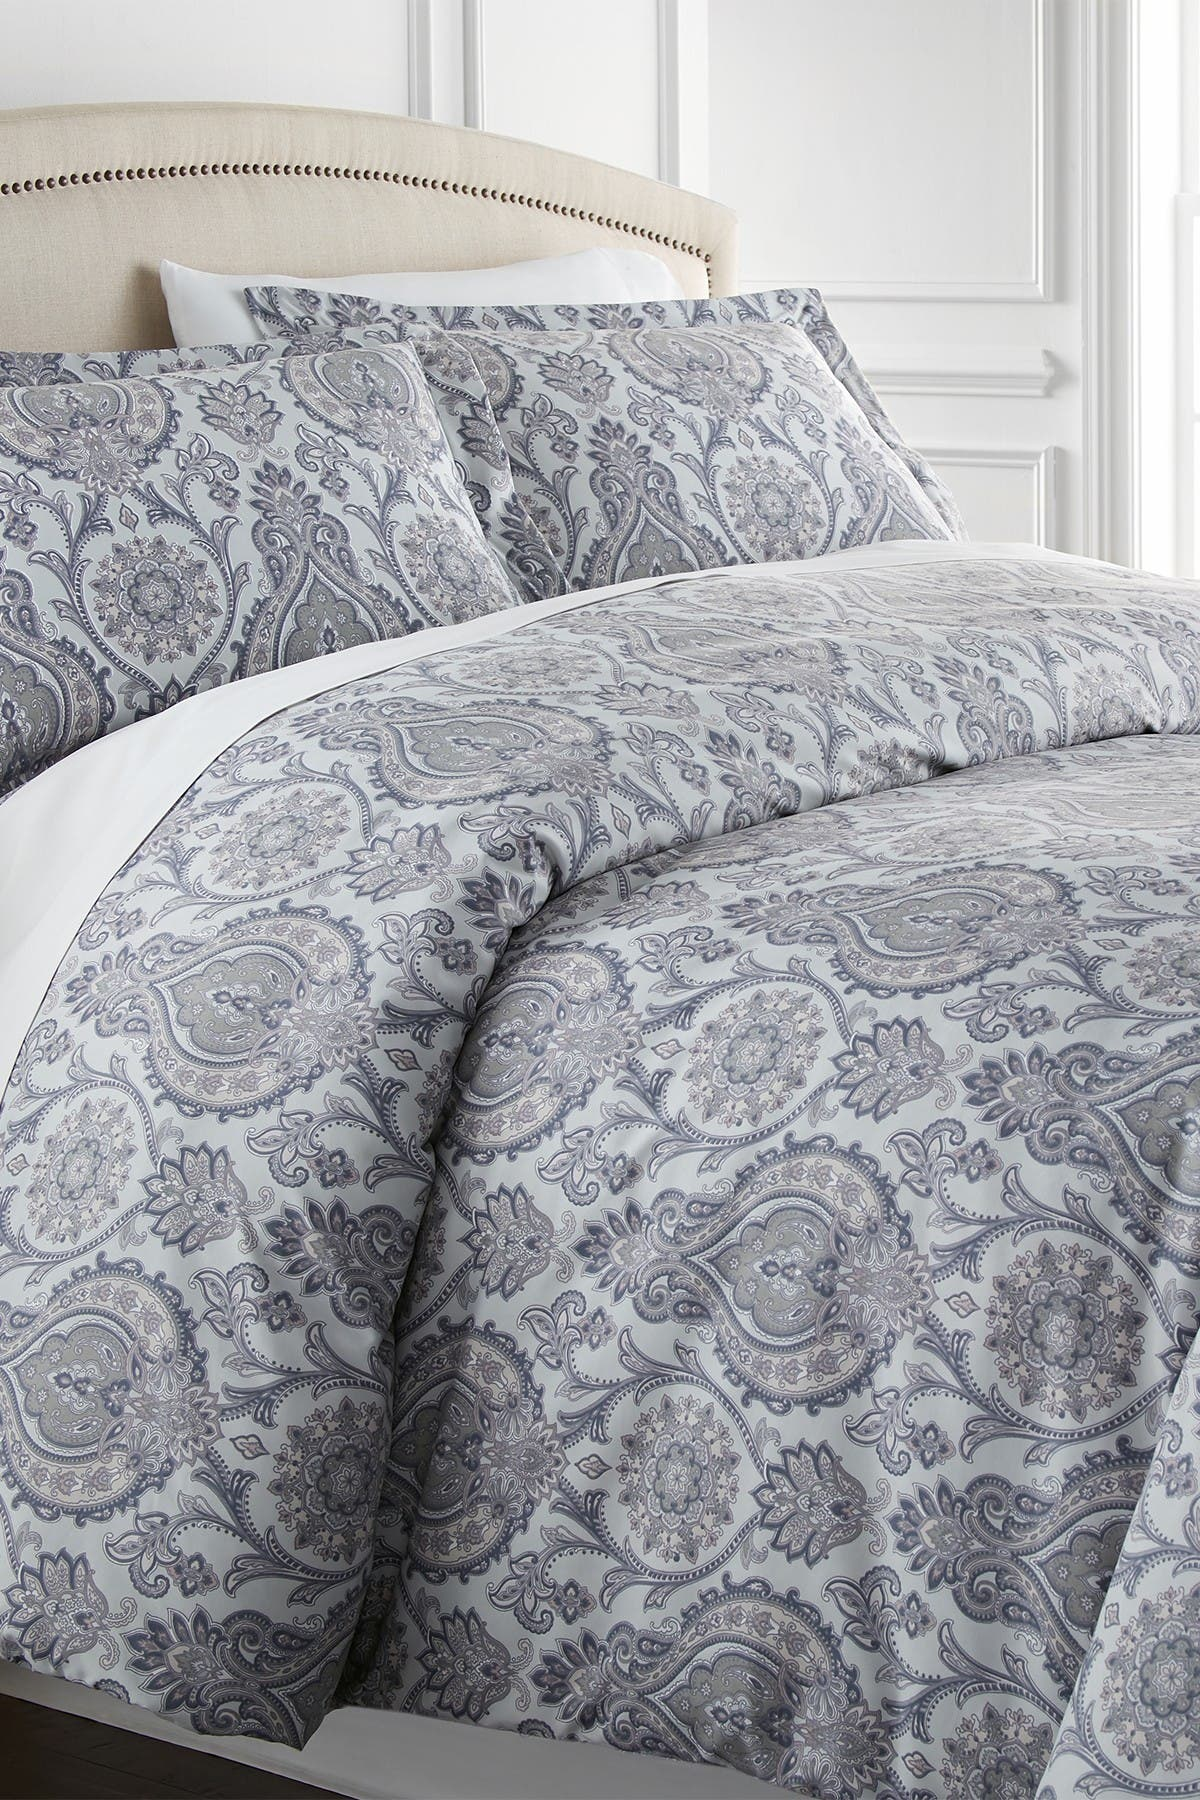 Southshore Fine Linens King California King Sized Luxury Premium Oversized Comforter Sets Boho Paisley Grey Nordstrom Rack